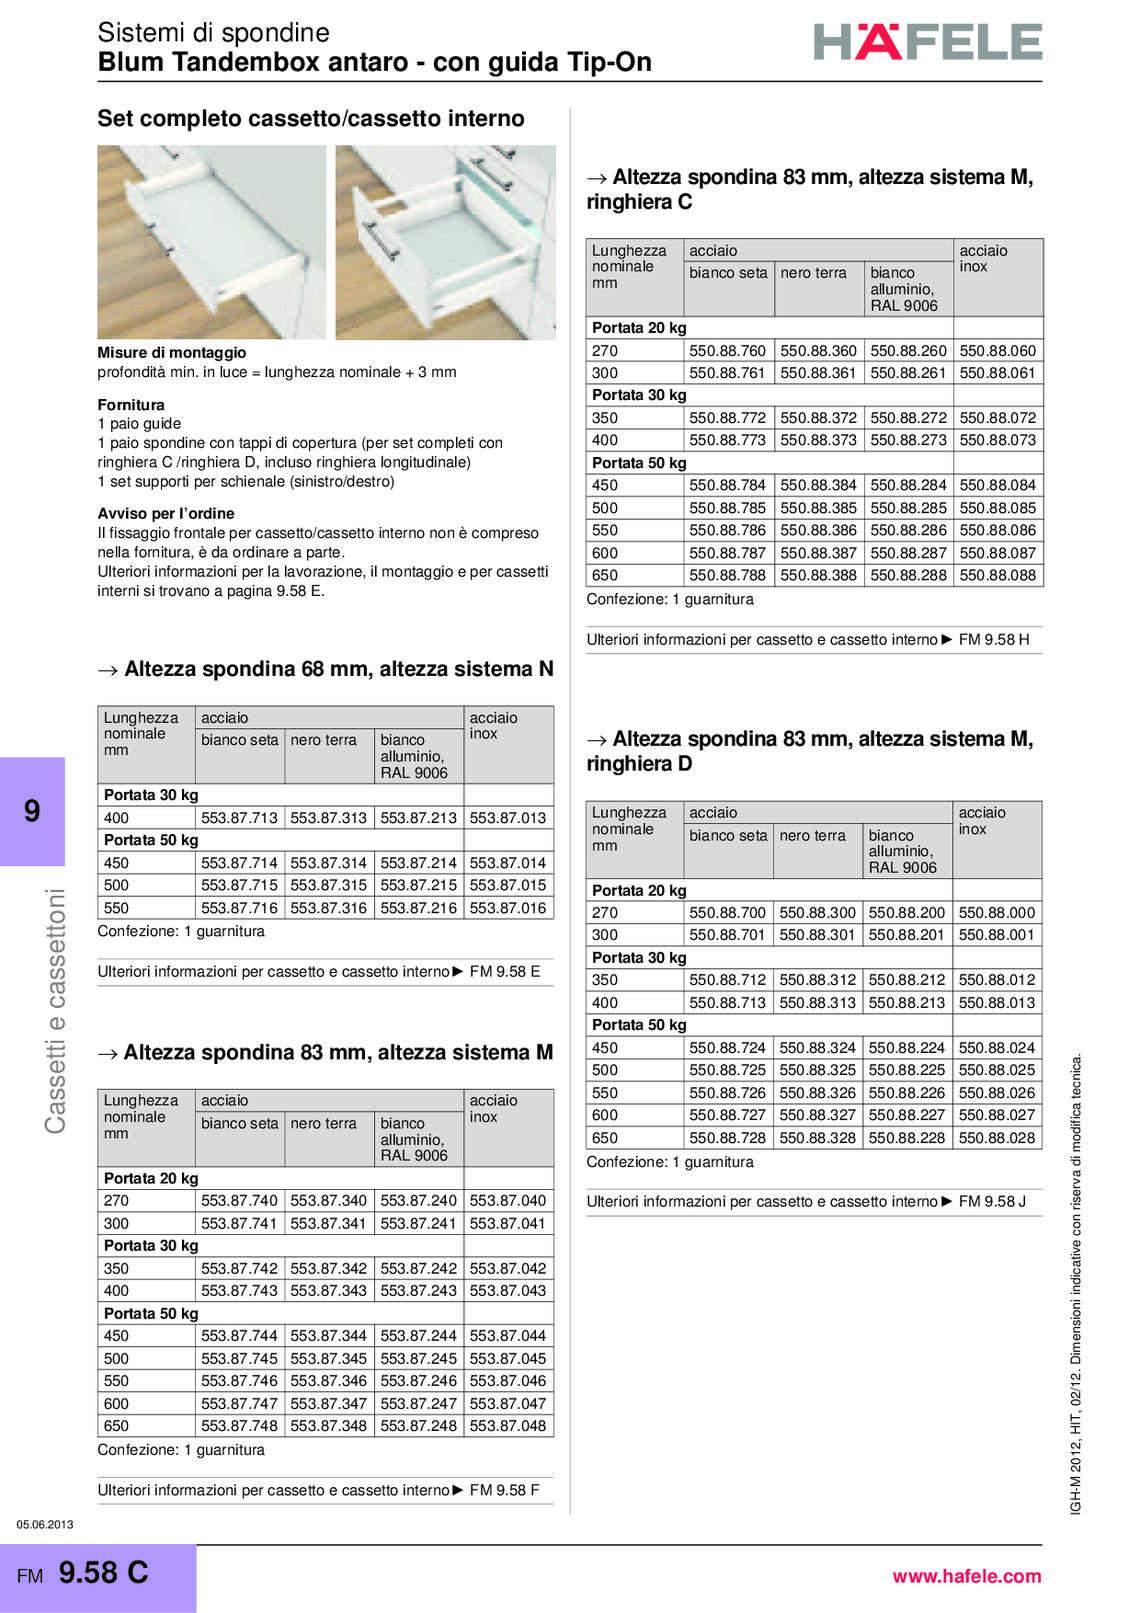 hafele-spondine-e-guide-per-mobili_40_077.jpg